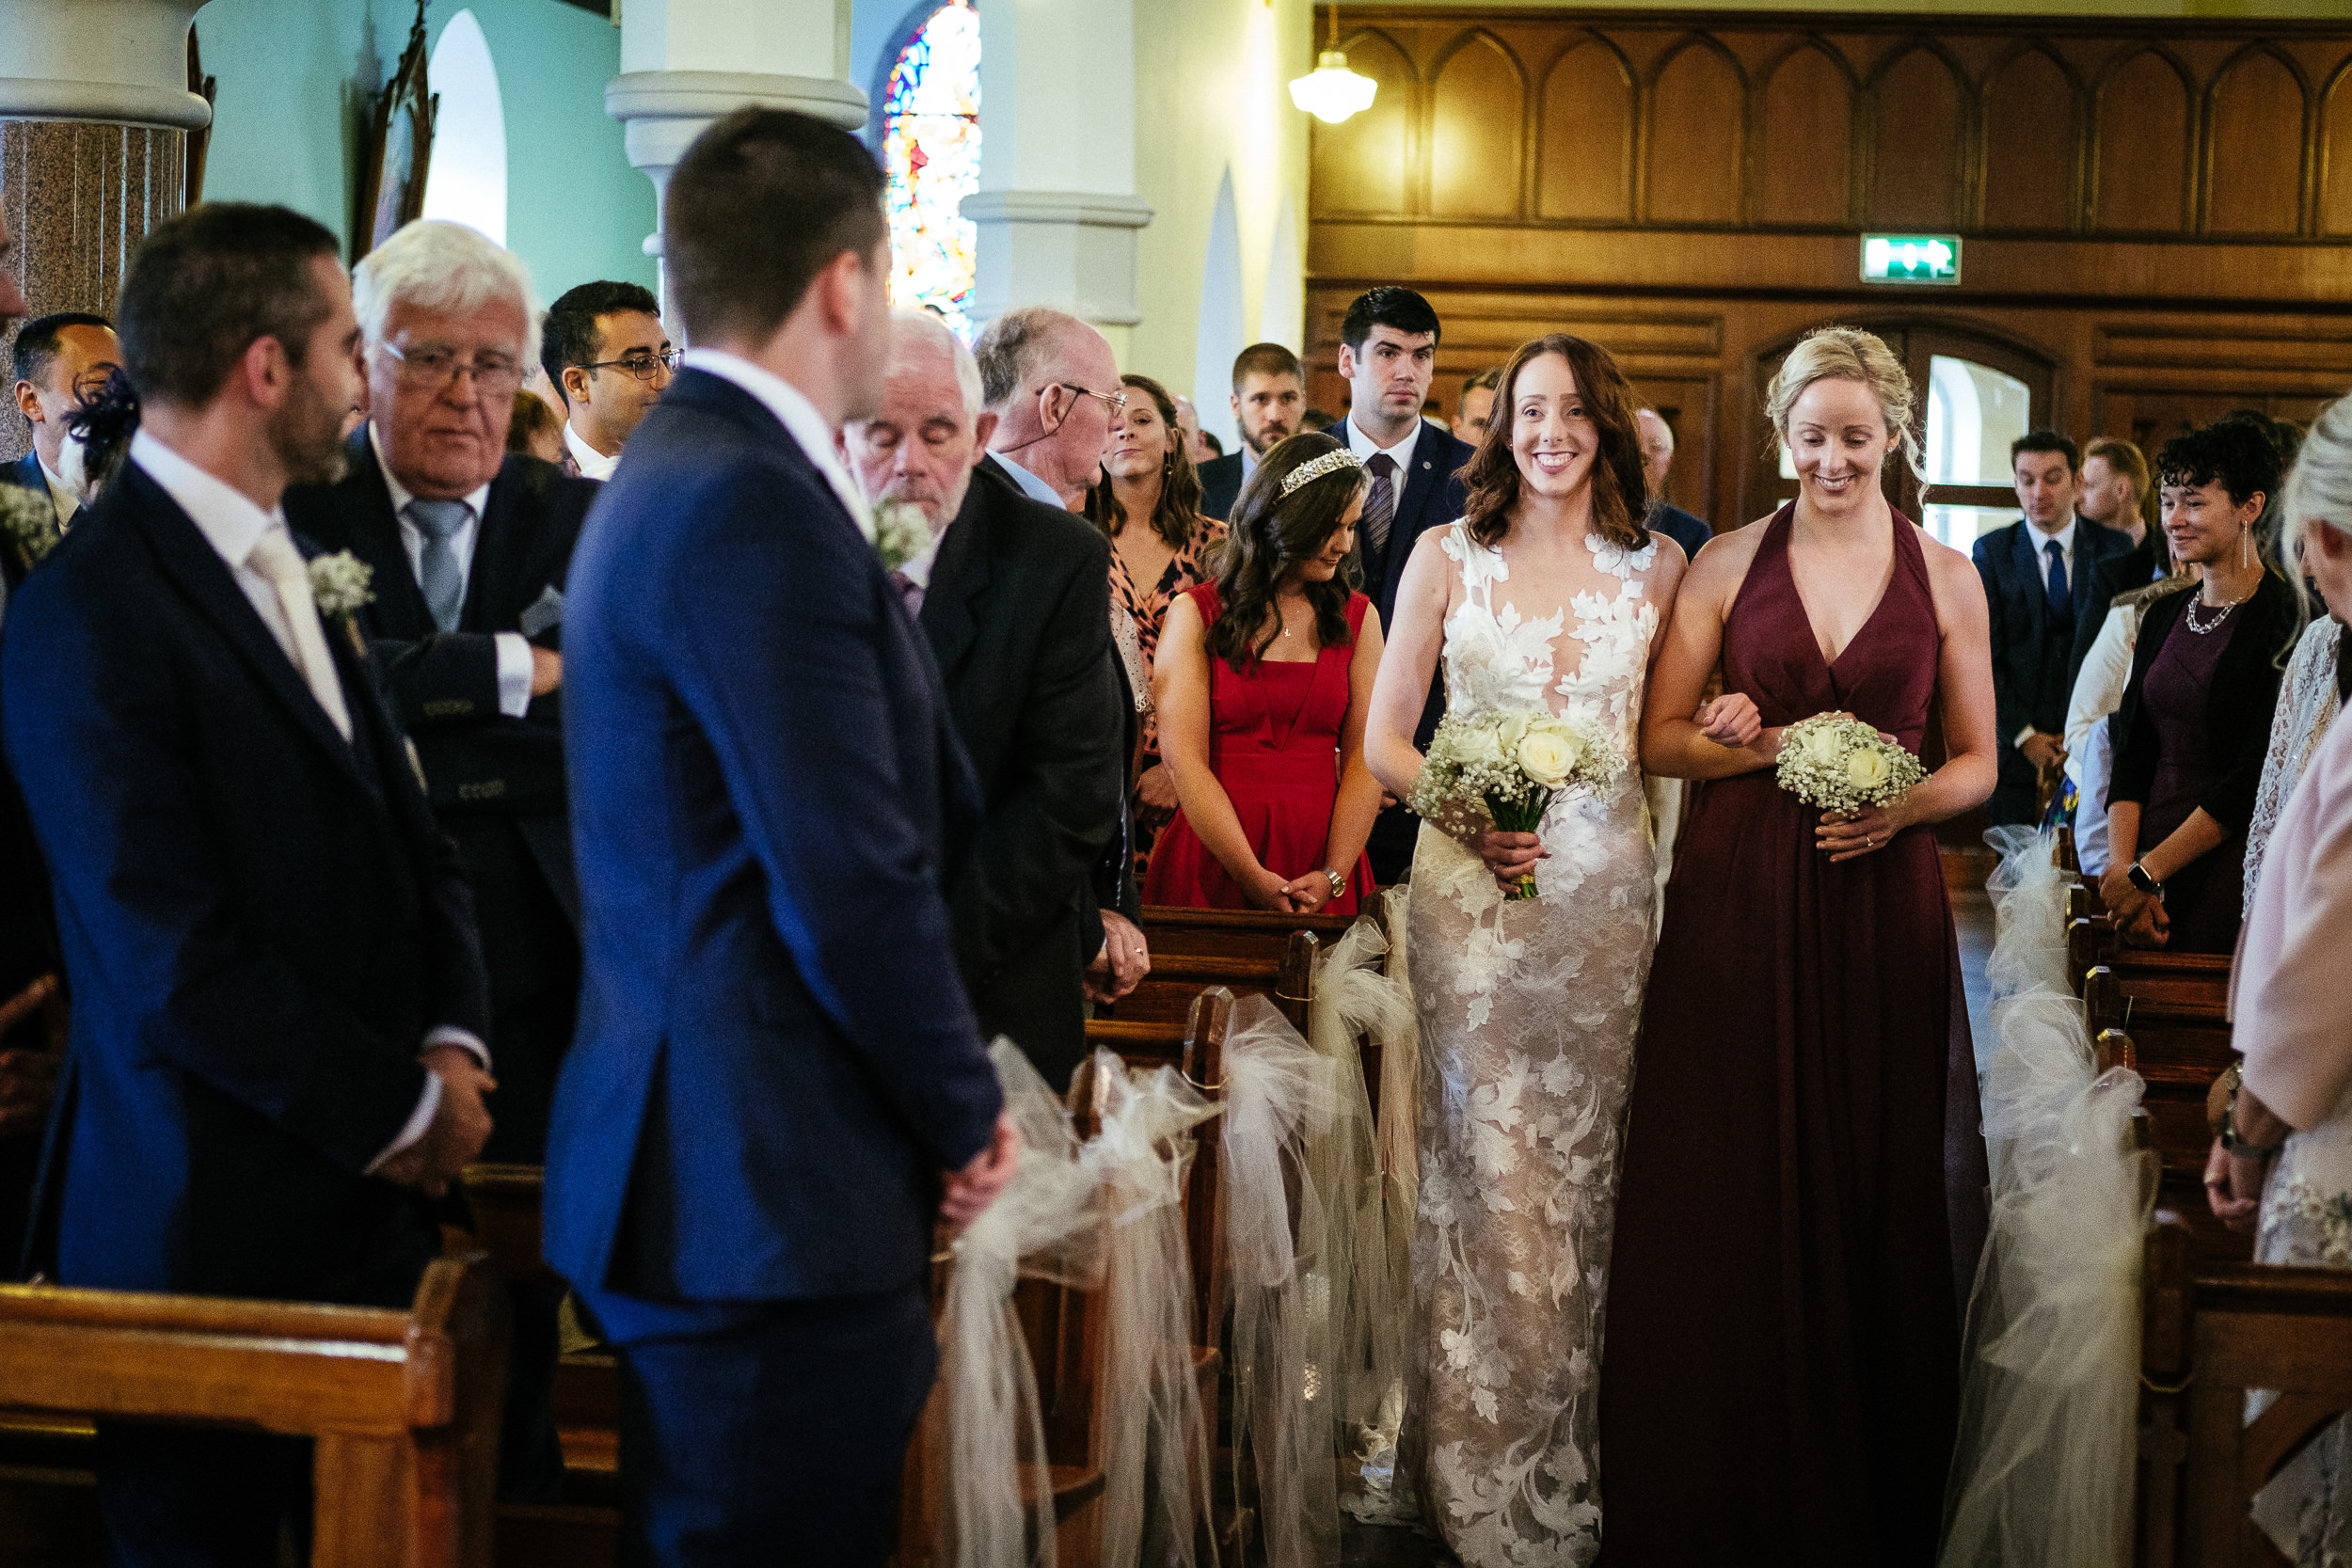 Dunmore House Hotel Clonakilty Cork Wedding Photographer 39